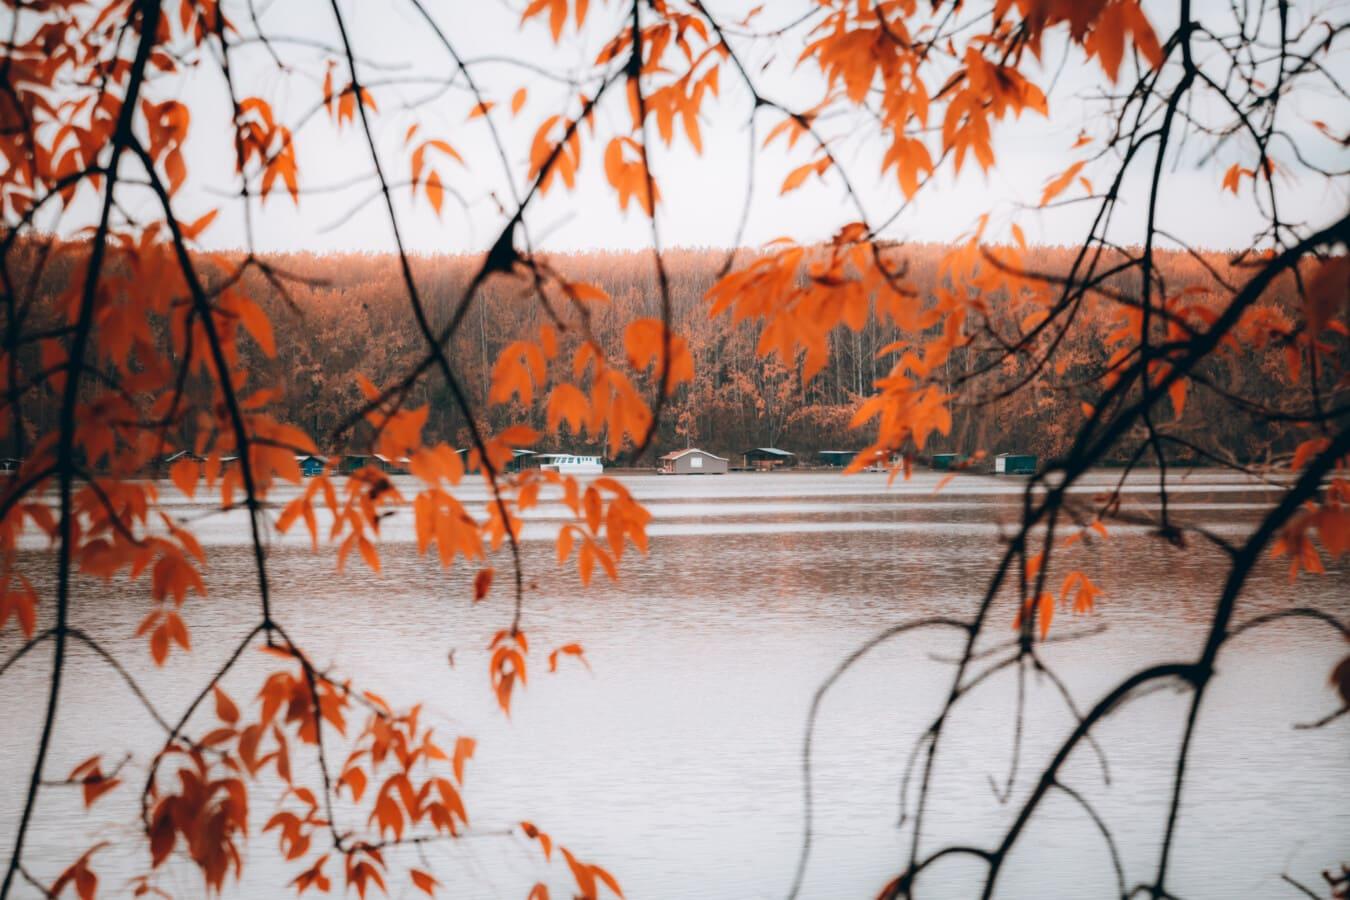 branches, autumn season, lakeside, resort area, boathouse, leaf, autumn, maple, tree, nature